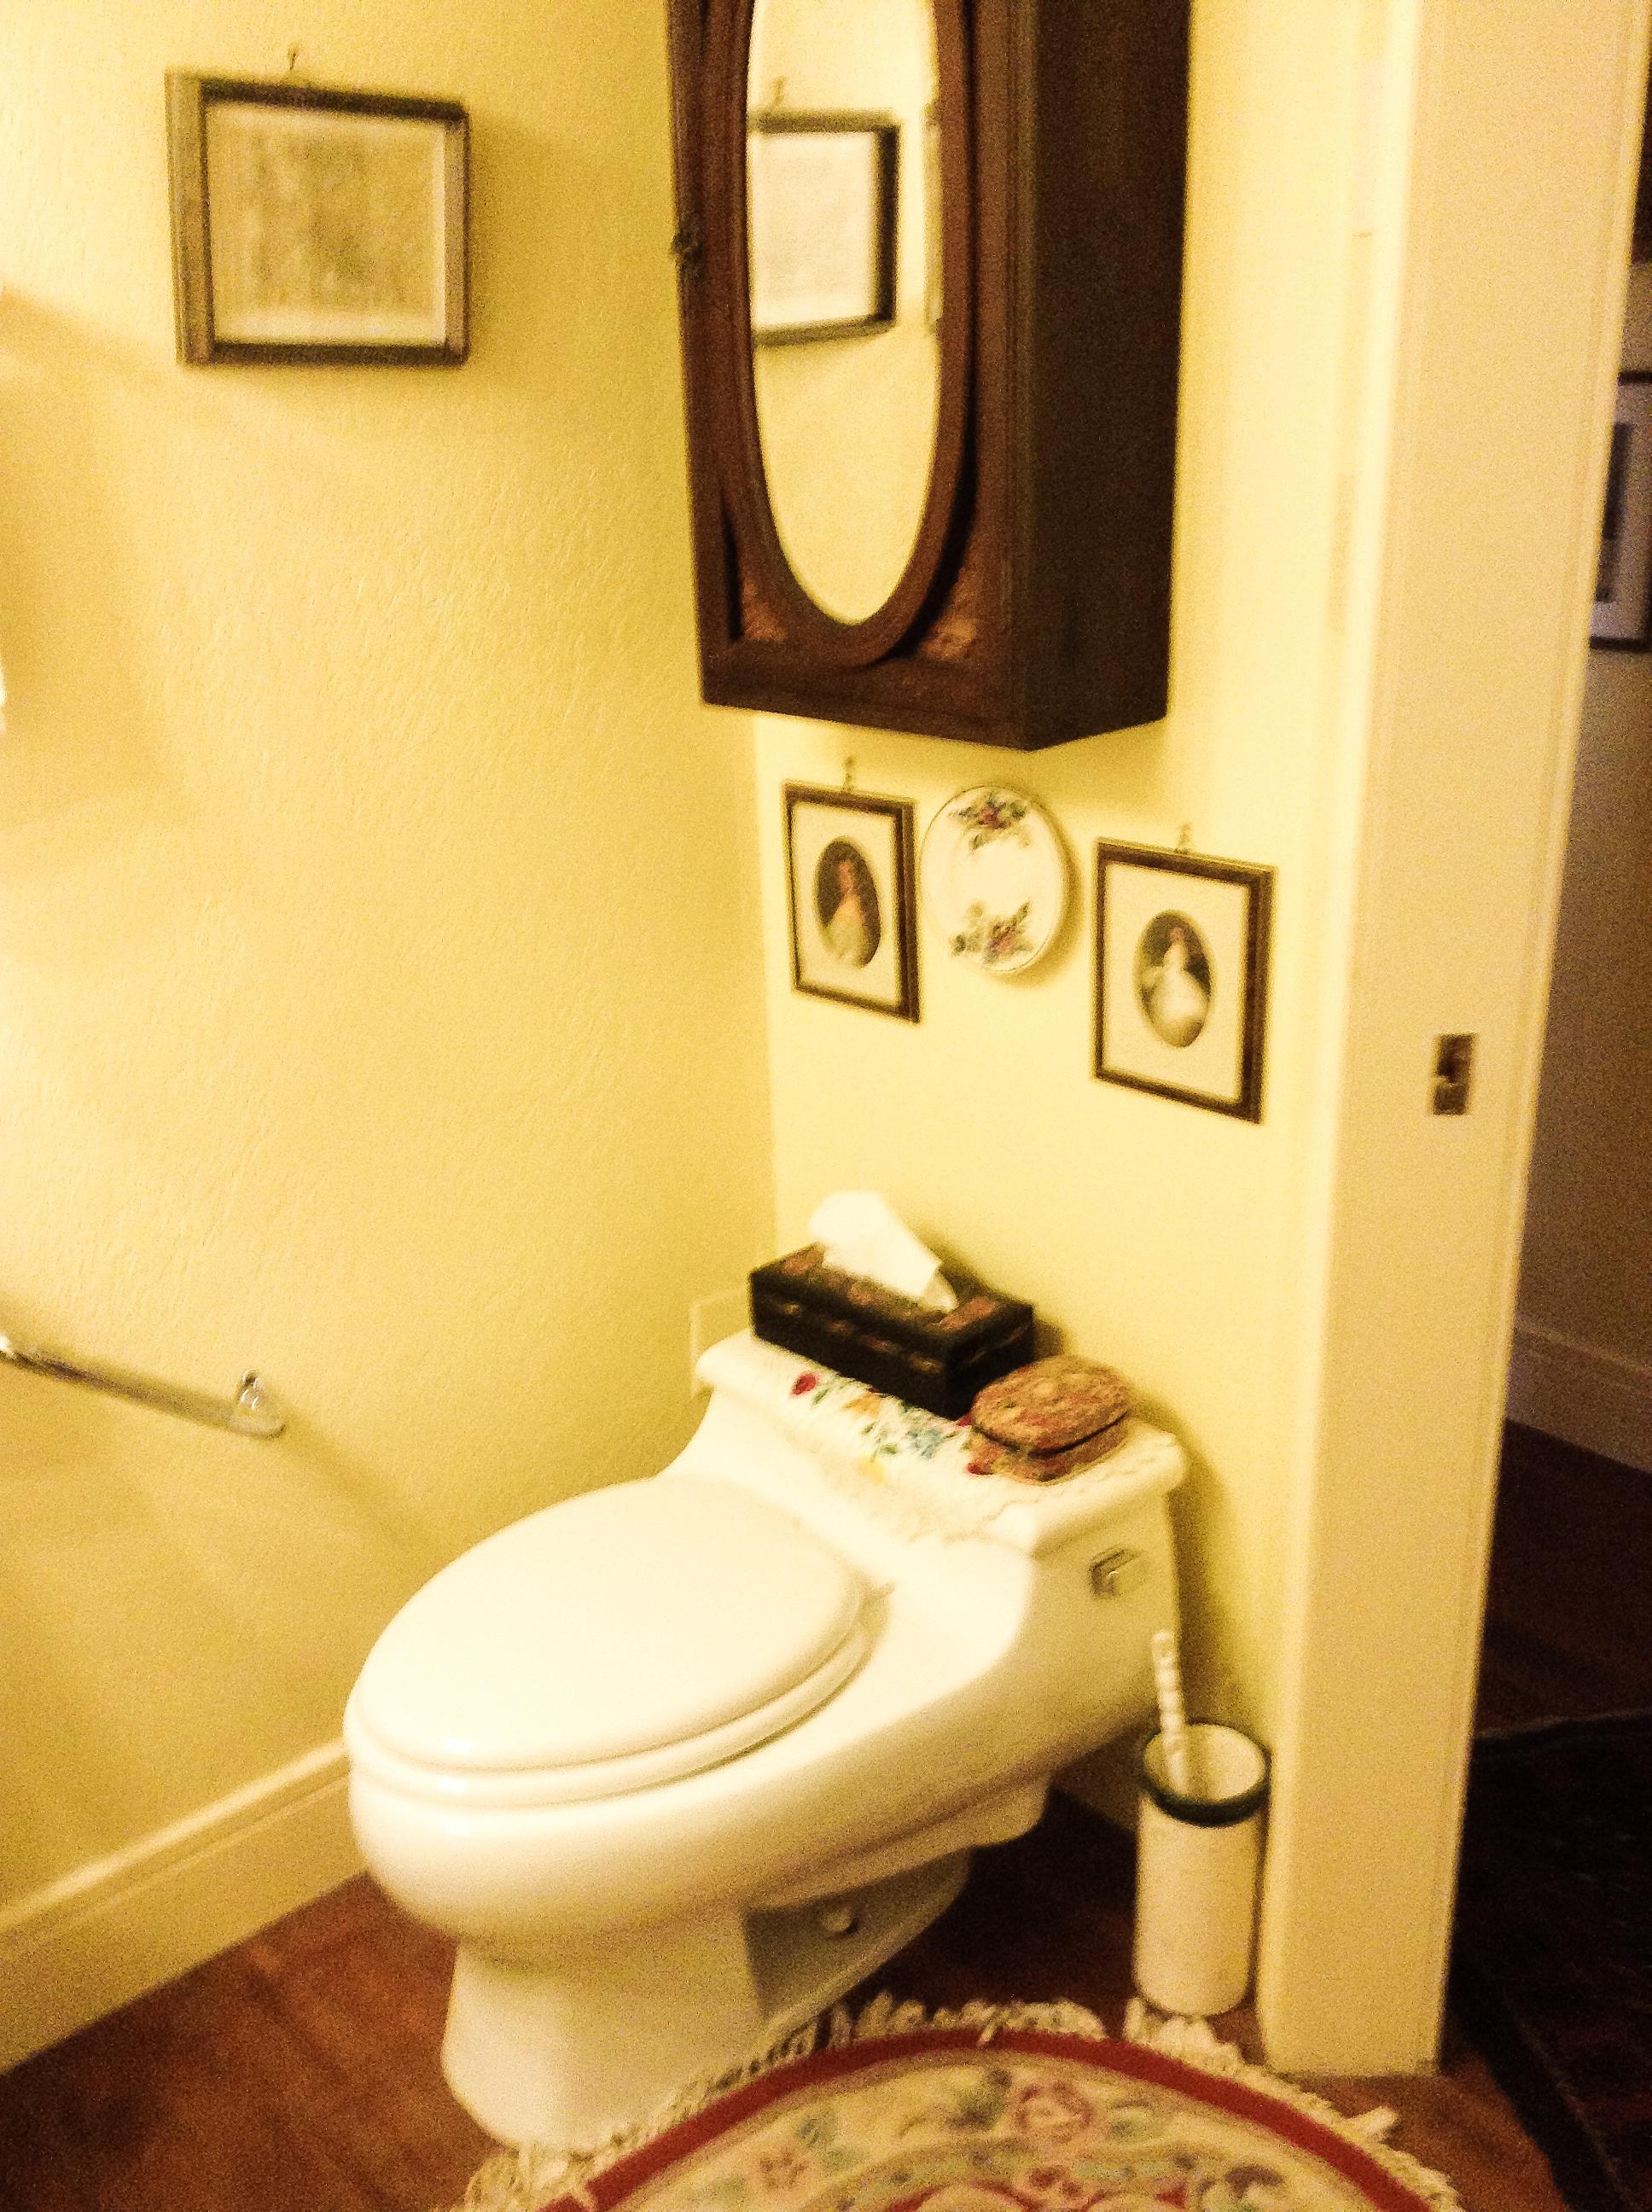 Kohler Toilet in Private Front Room Guest Room